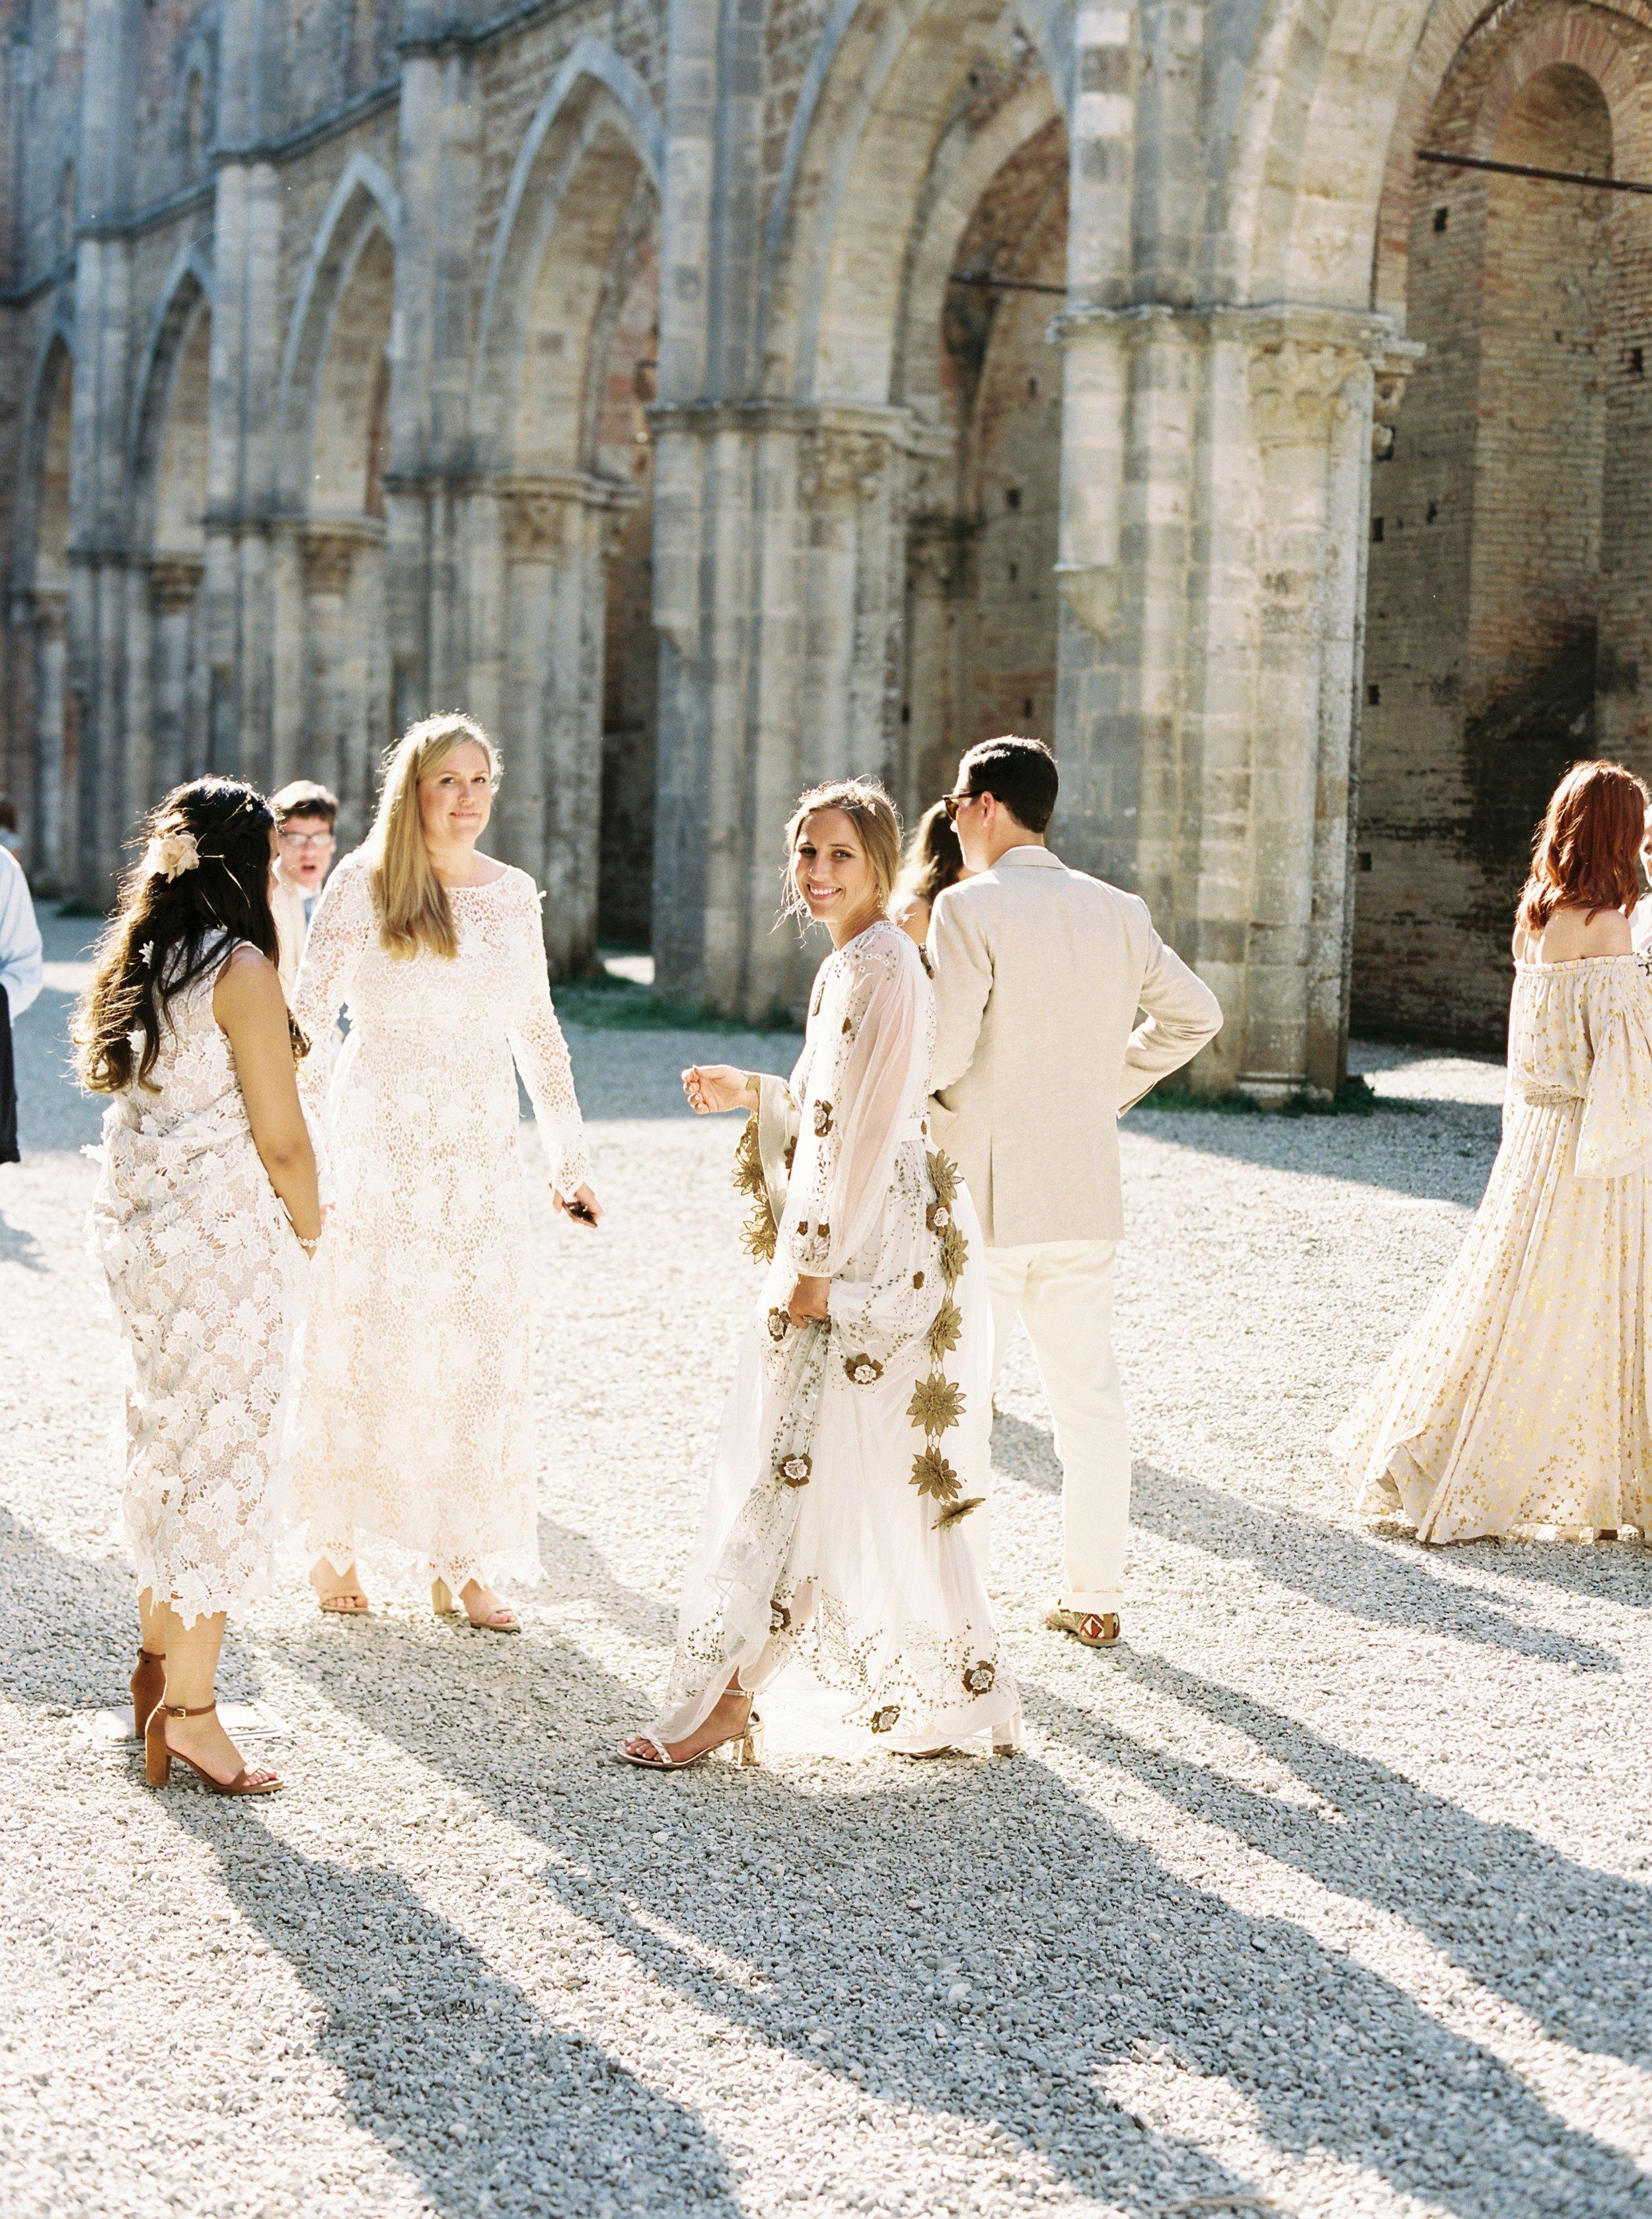 Kyle John l Fine Art Wedding Photography l Chicago, Copenhagen, California, New York, Destination l Blog l Alexis and Zach_Borgo Santo Pietro_Italy_Tuscany_57